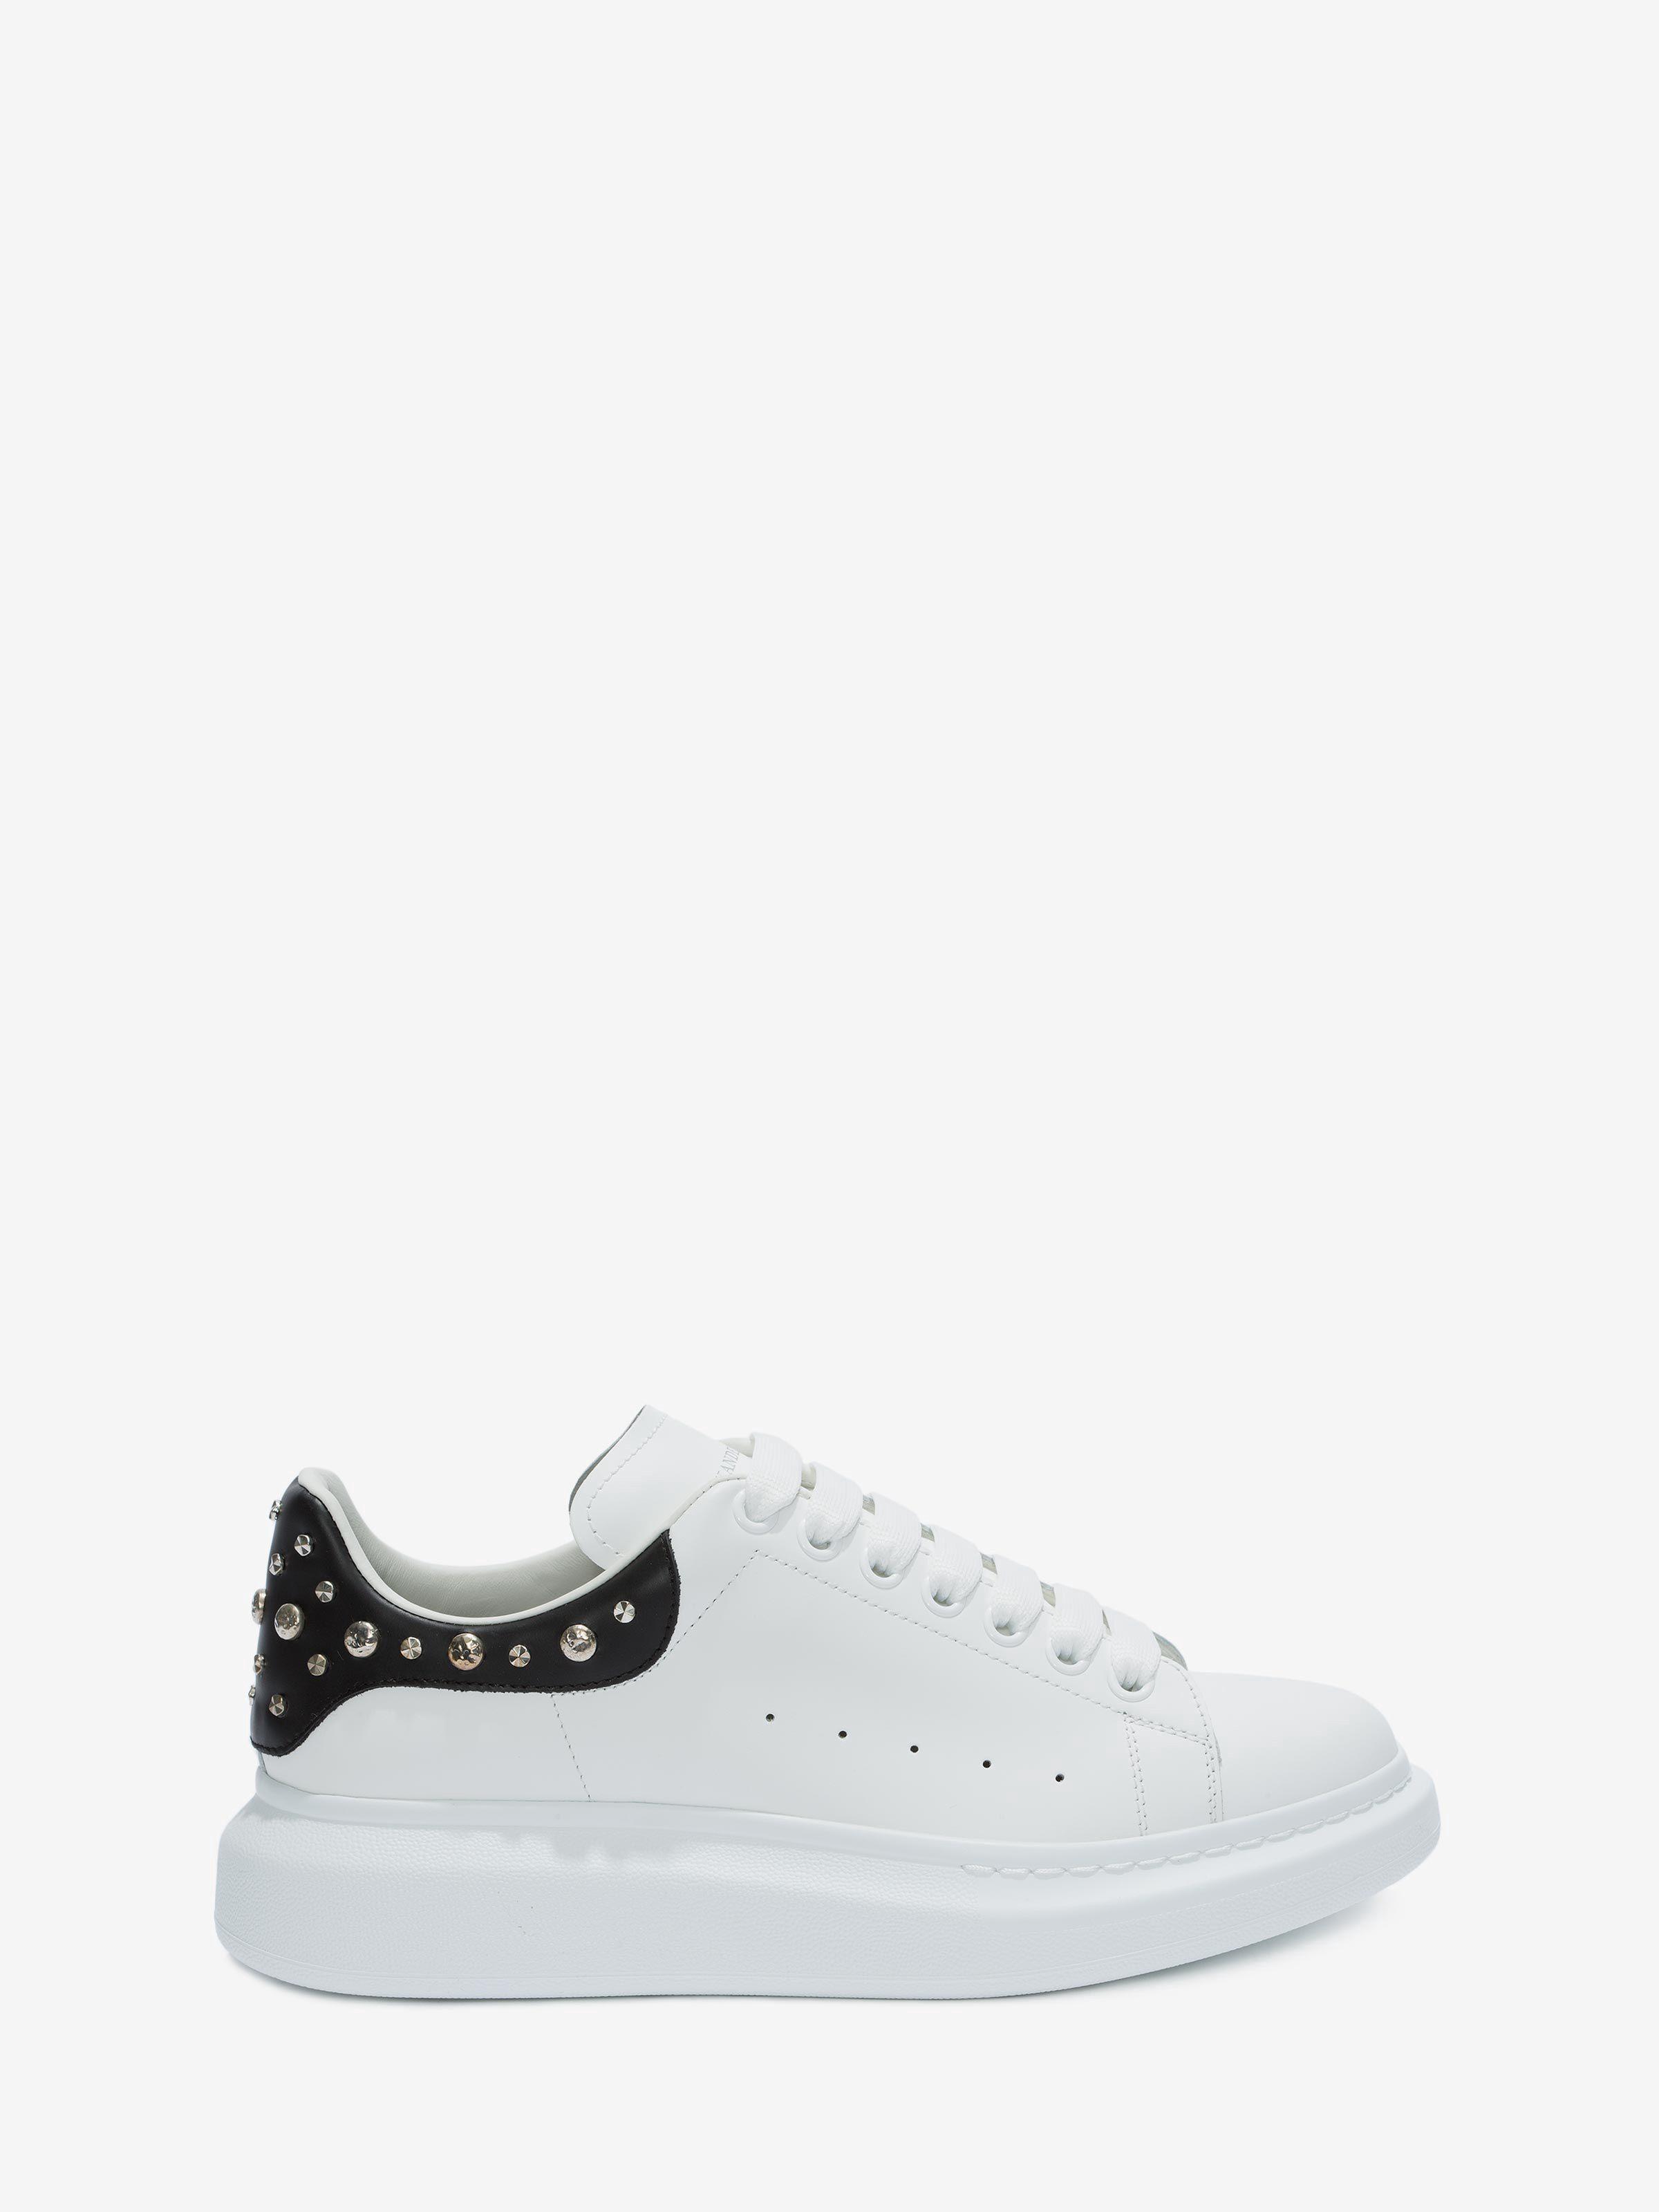 bb10d17f531e Alexander Mcqueen Oversized Sneaker - Black 43.5 in 2019 | Products ...